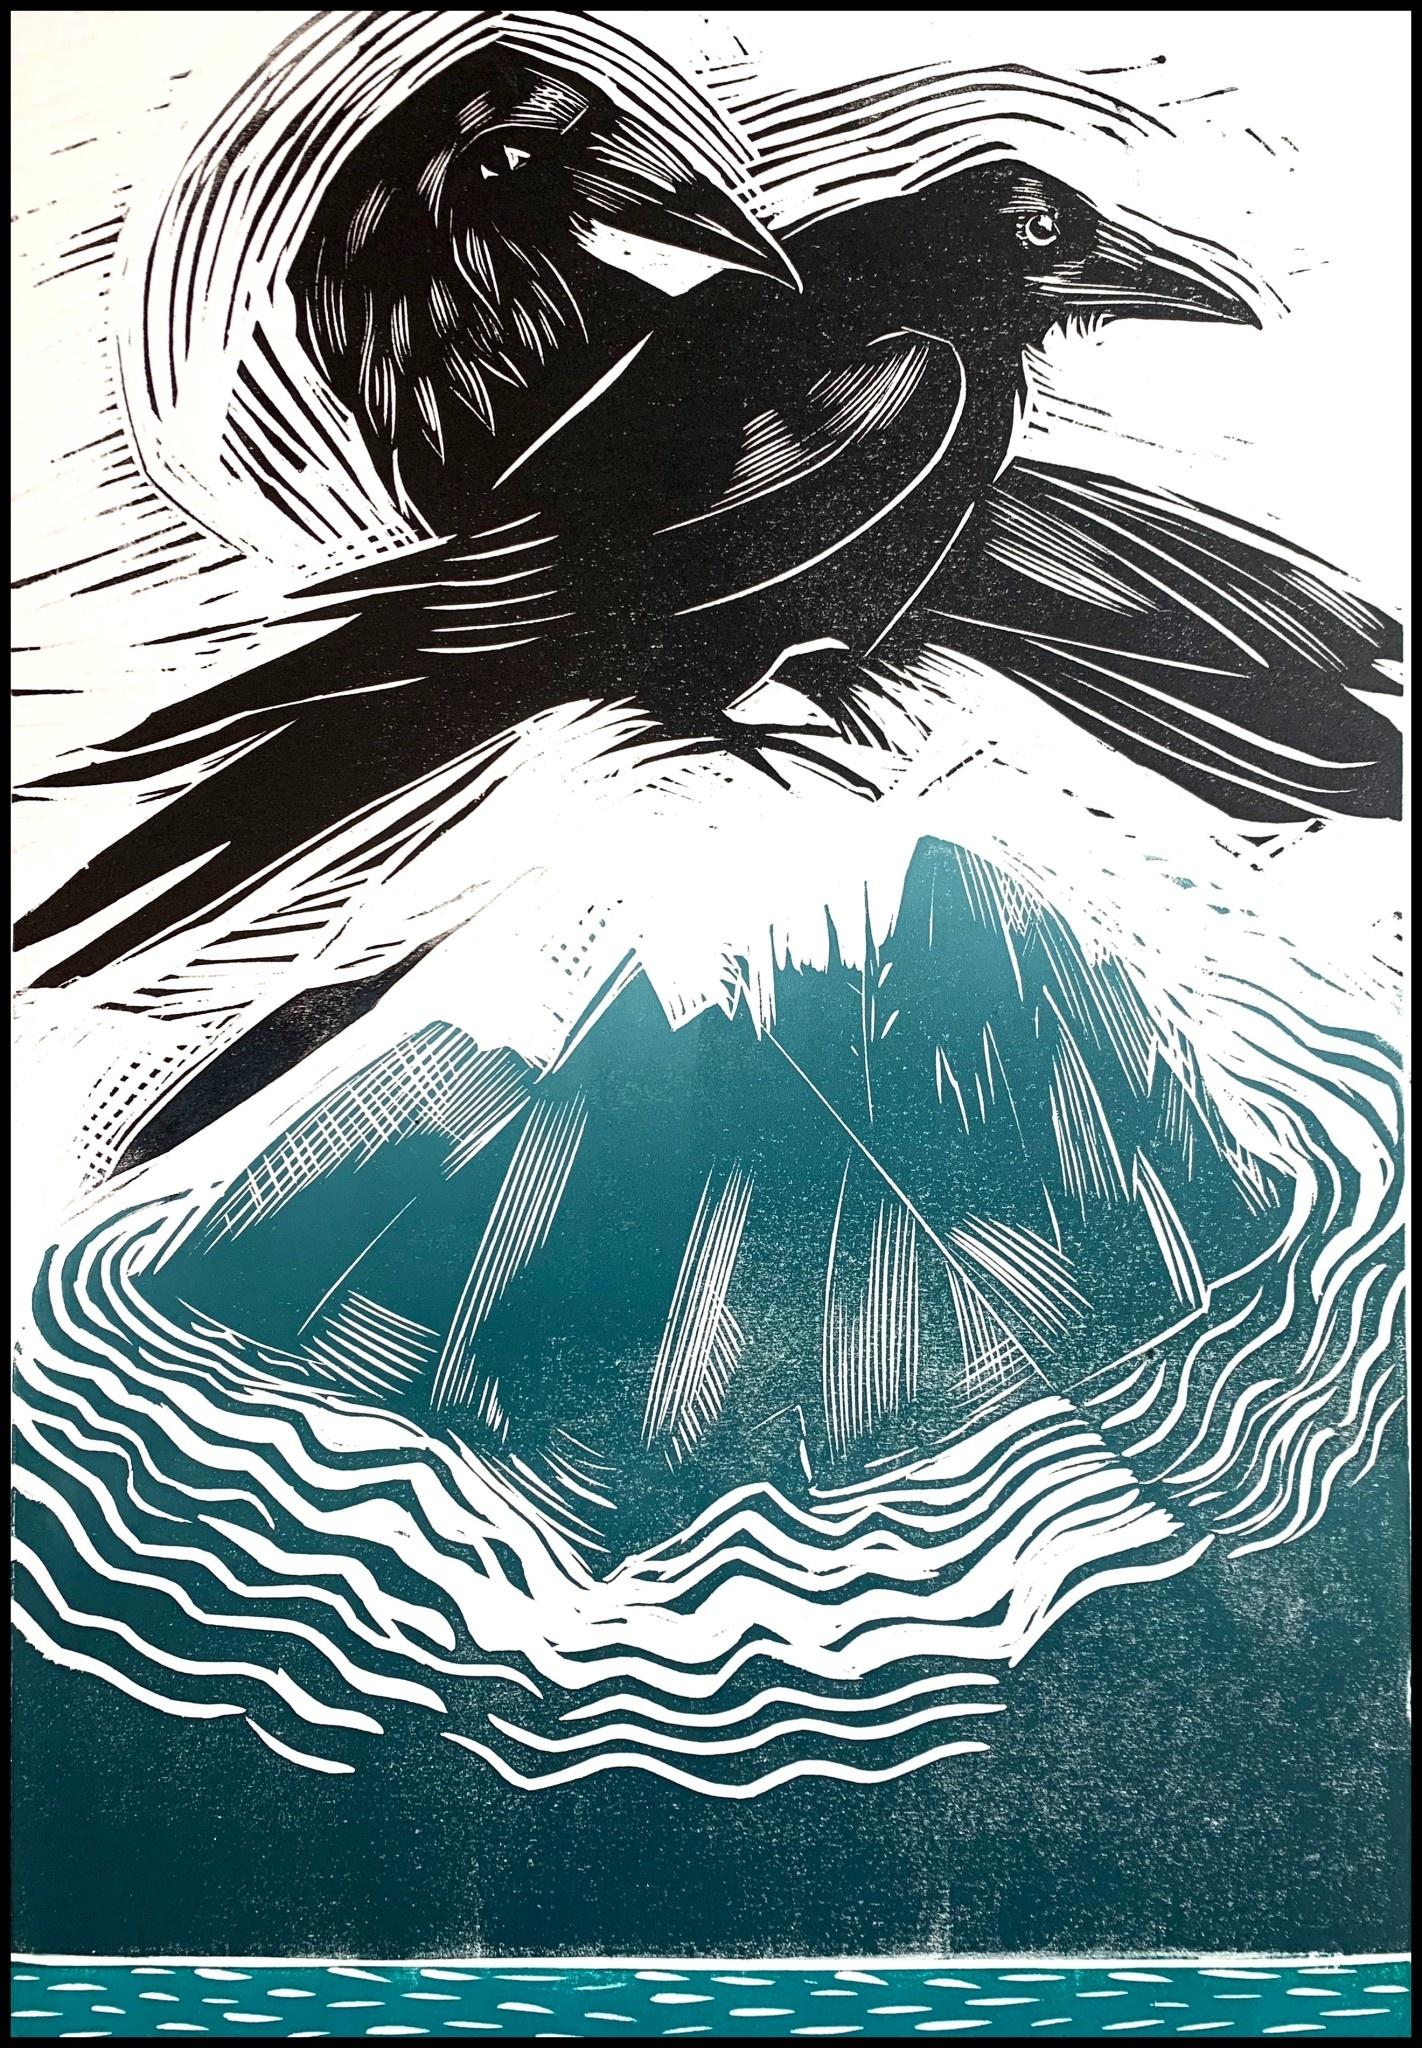 Haida Gwaii # 2 (framed)-1